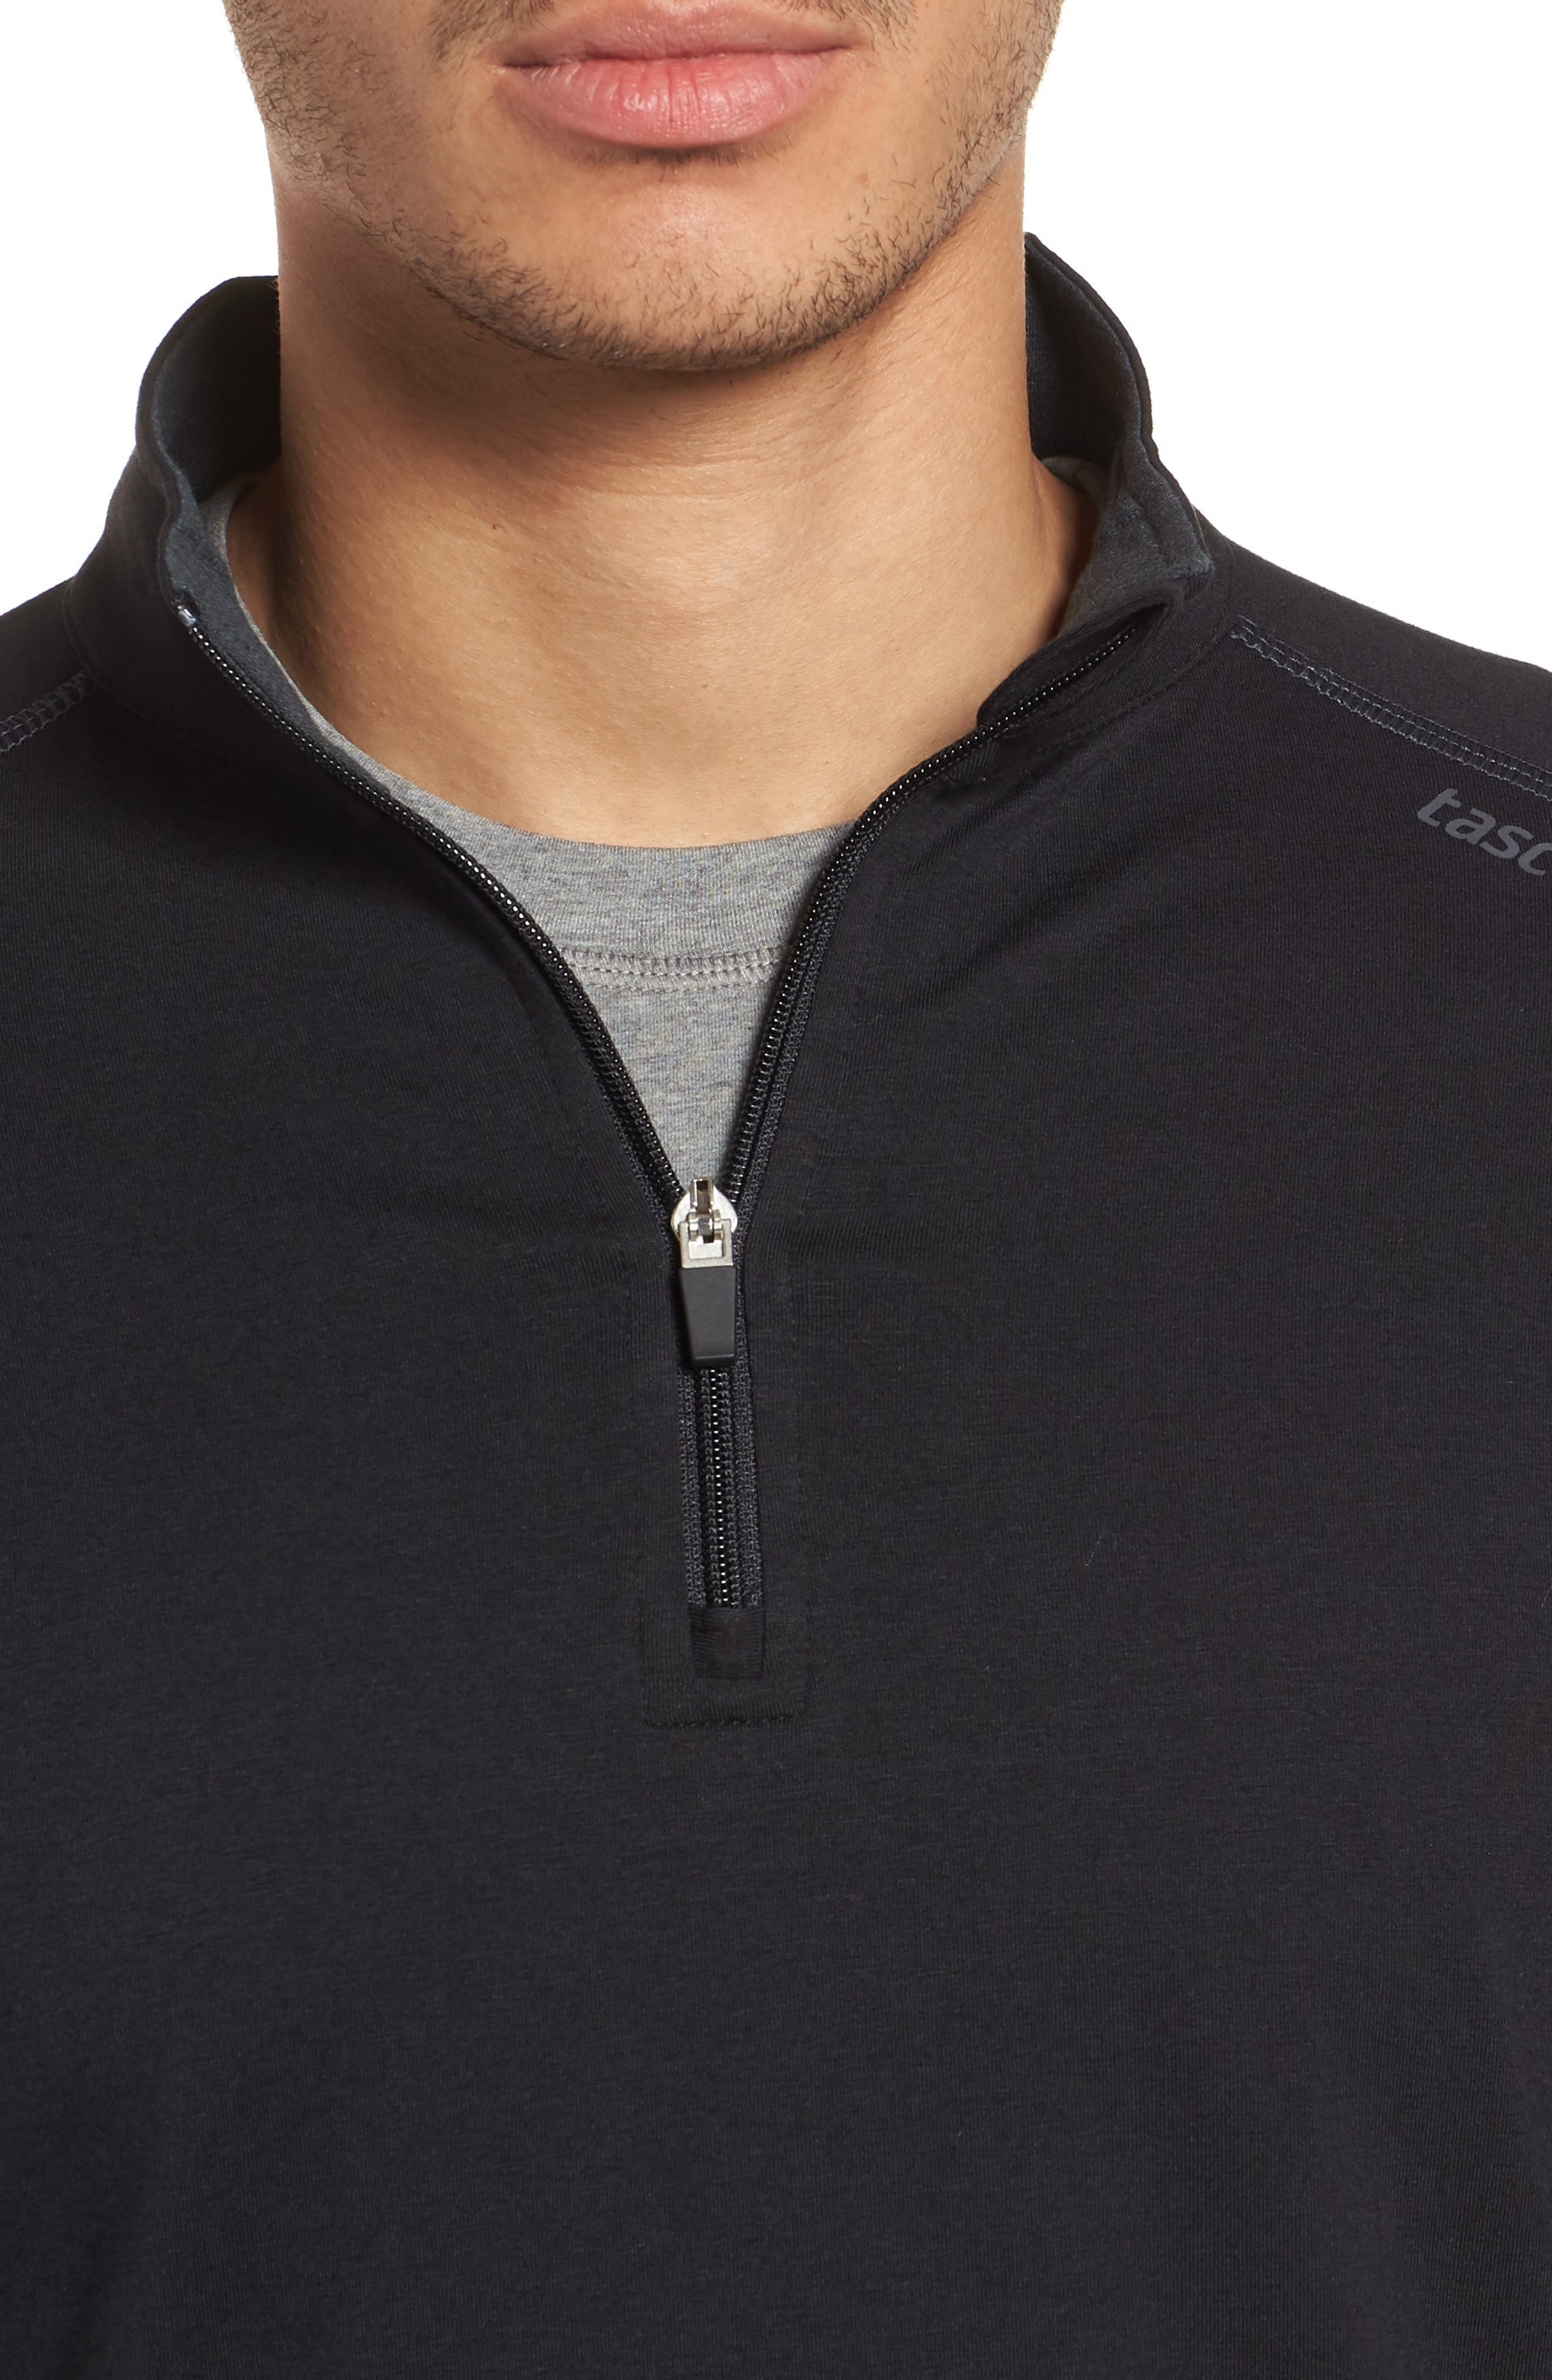 Carrollton Quarter Zip Sweatshirt,                             Alternate thumbnail 4, color,                             BLACK/ GUNMETAL